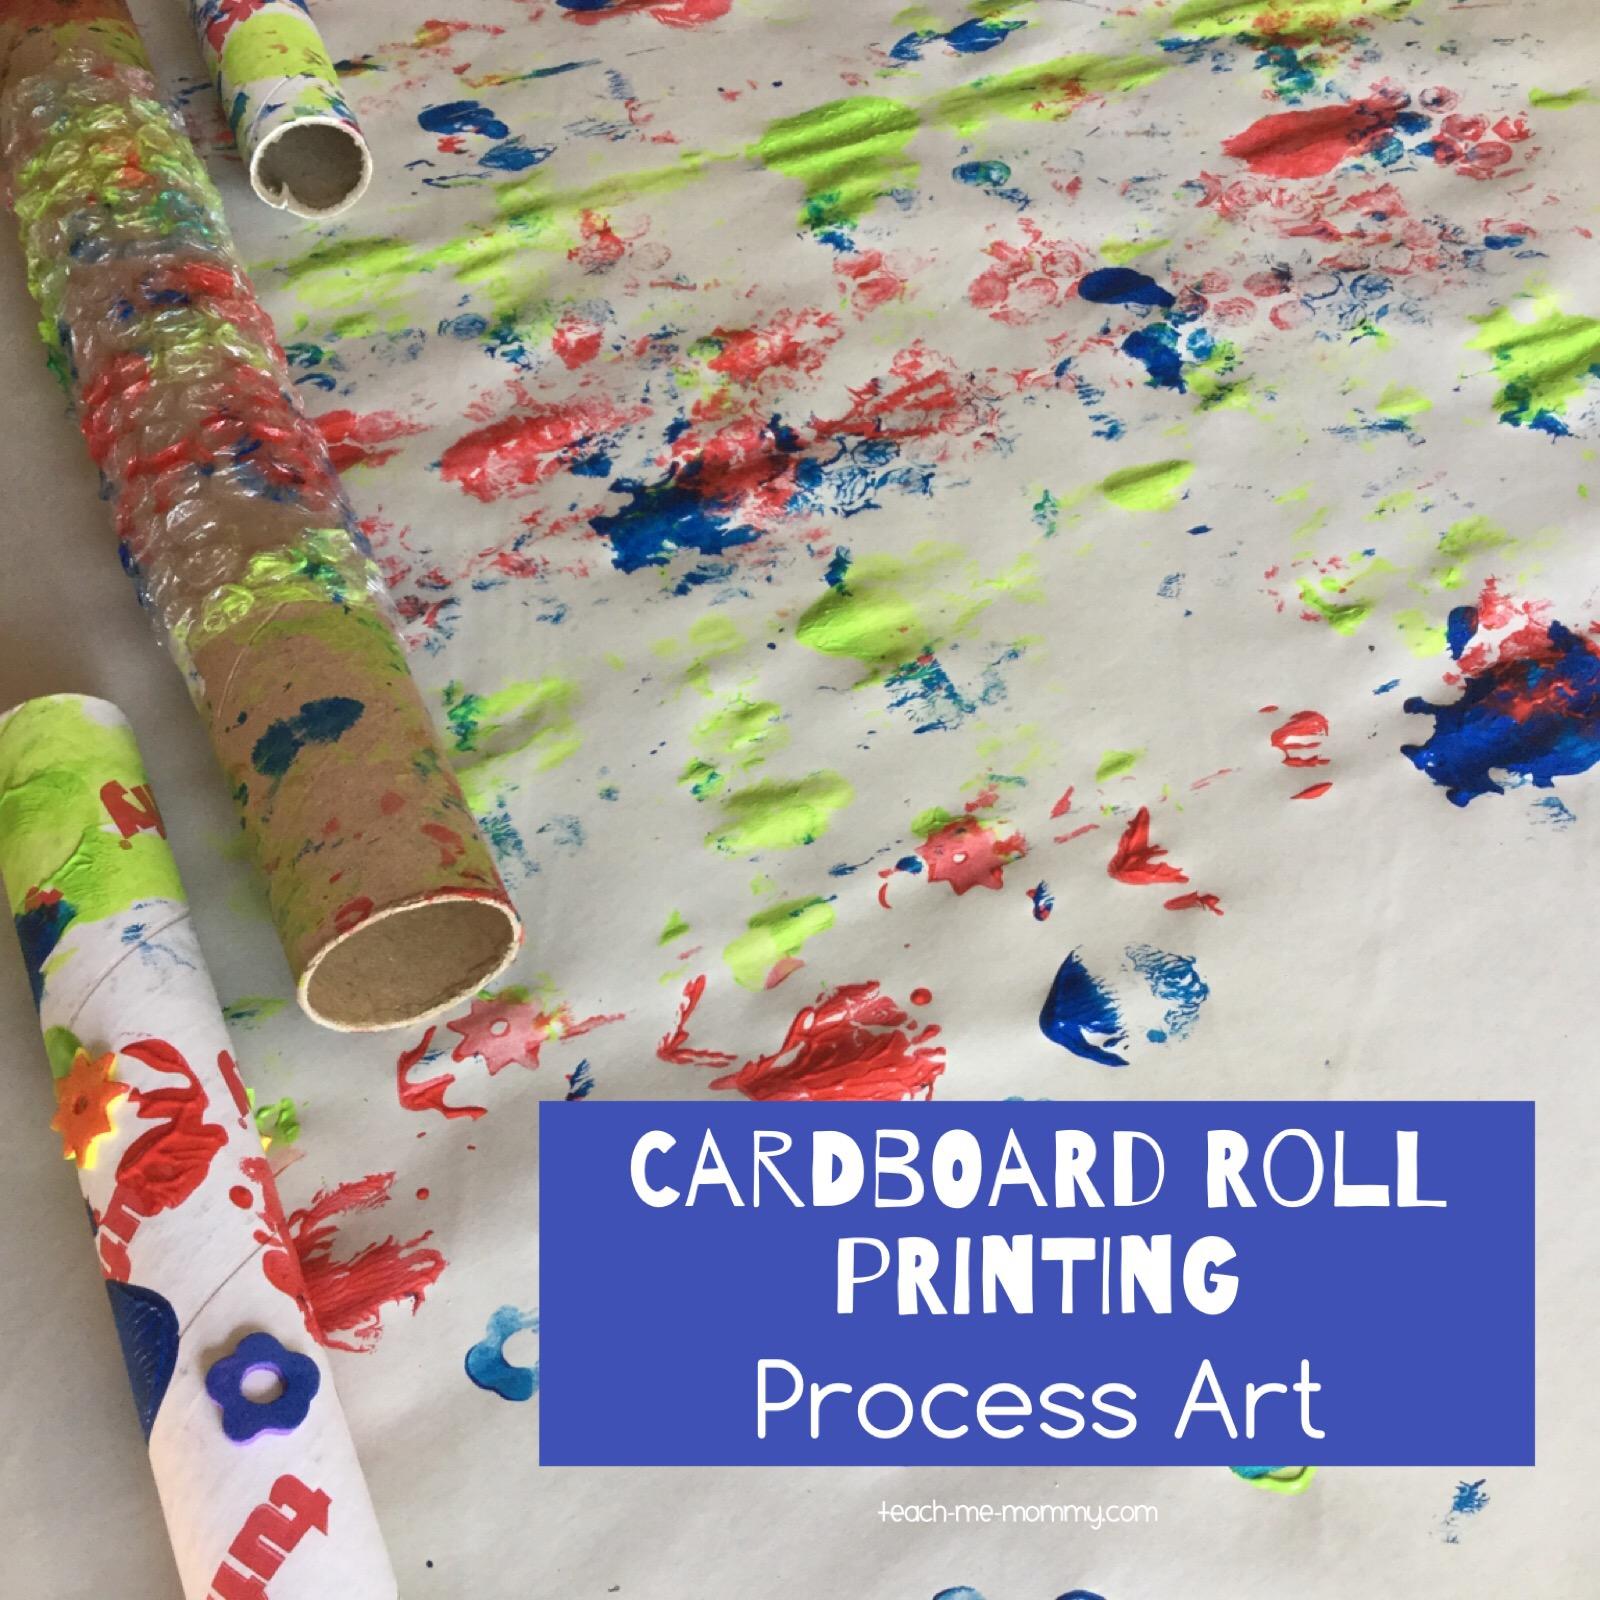 cardboard roll printing